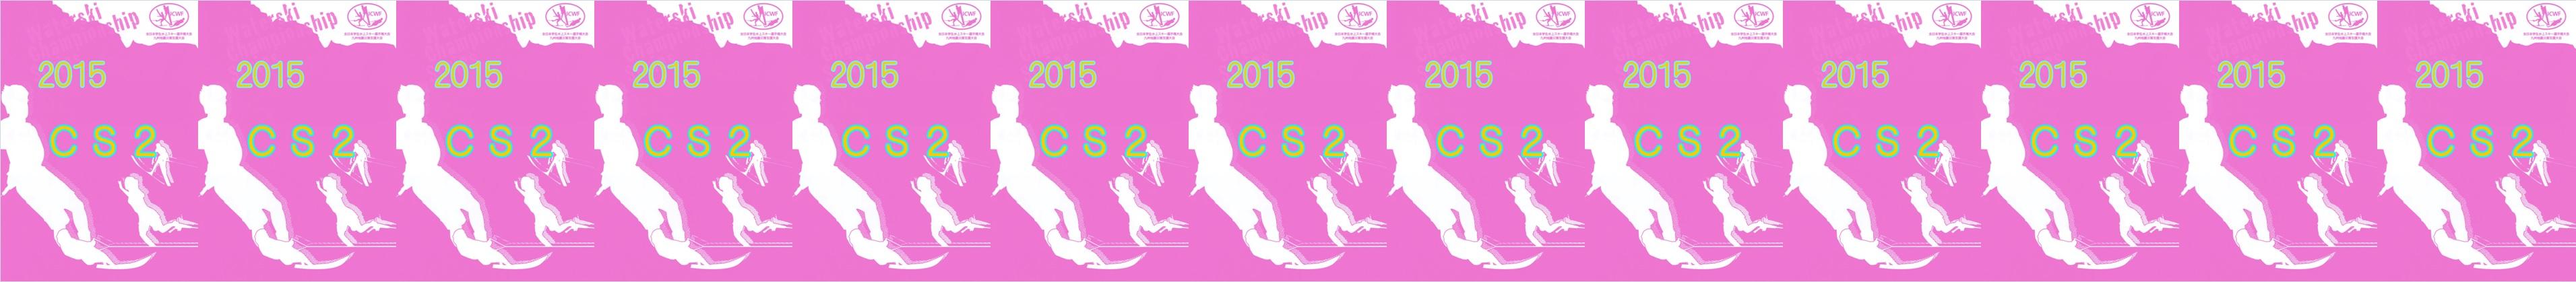 2015CS2 W's Title